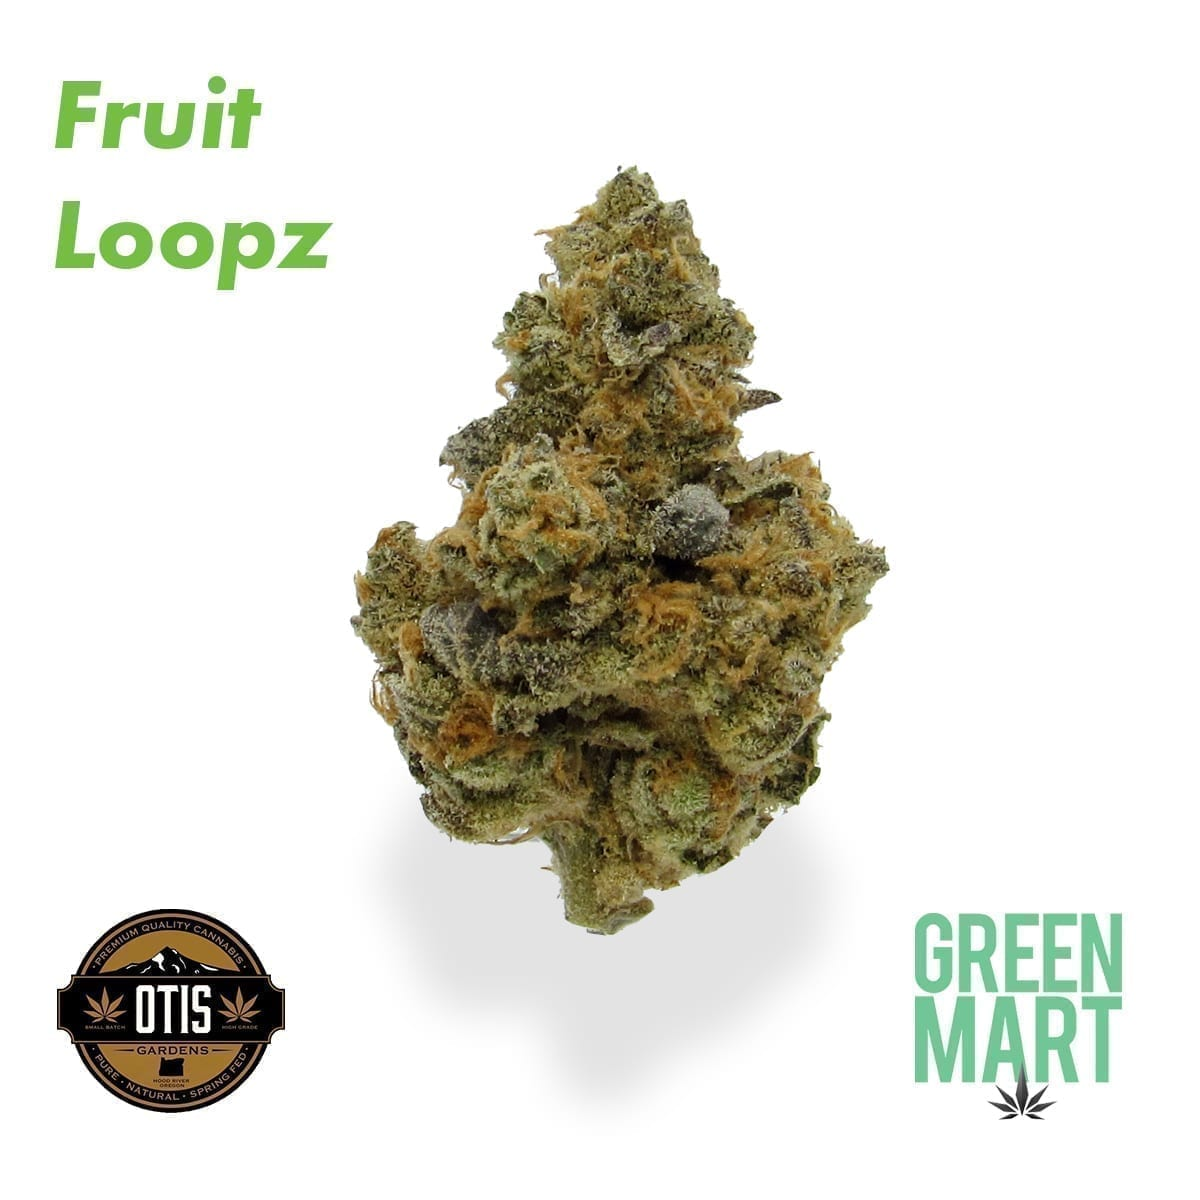 Fruit Loopz